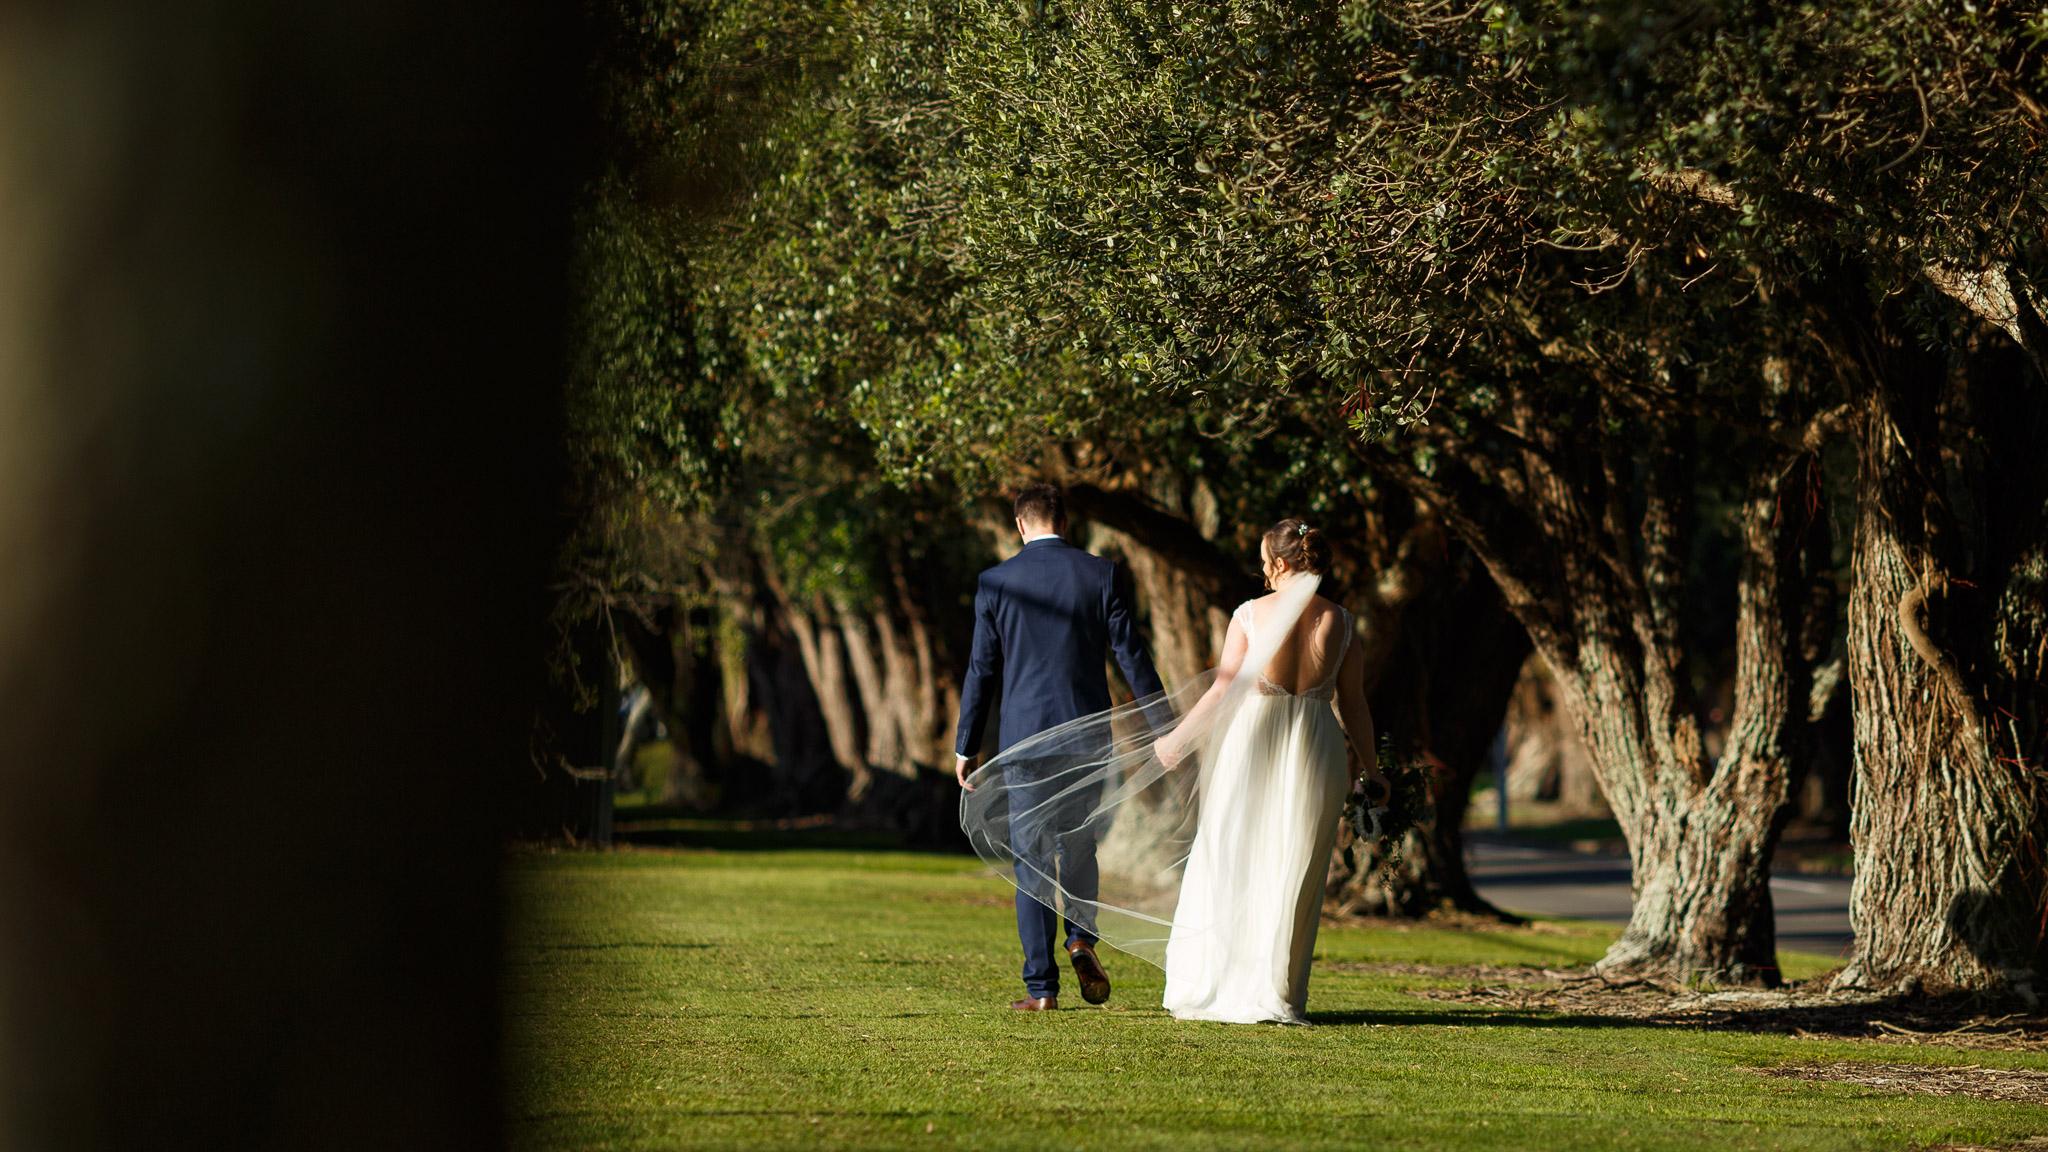 highlight_wedding_photography_manawatu_palmerston_north_new_zealand_rangitikei_golf_ohakea-44.jpg